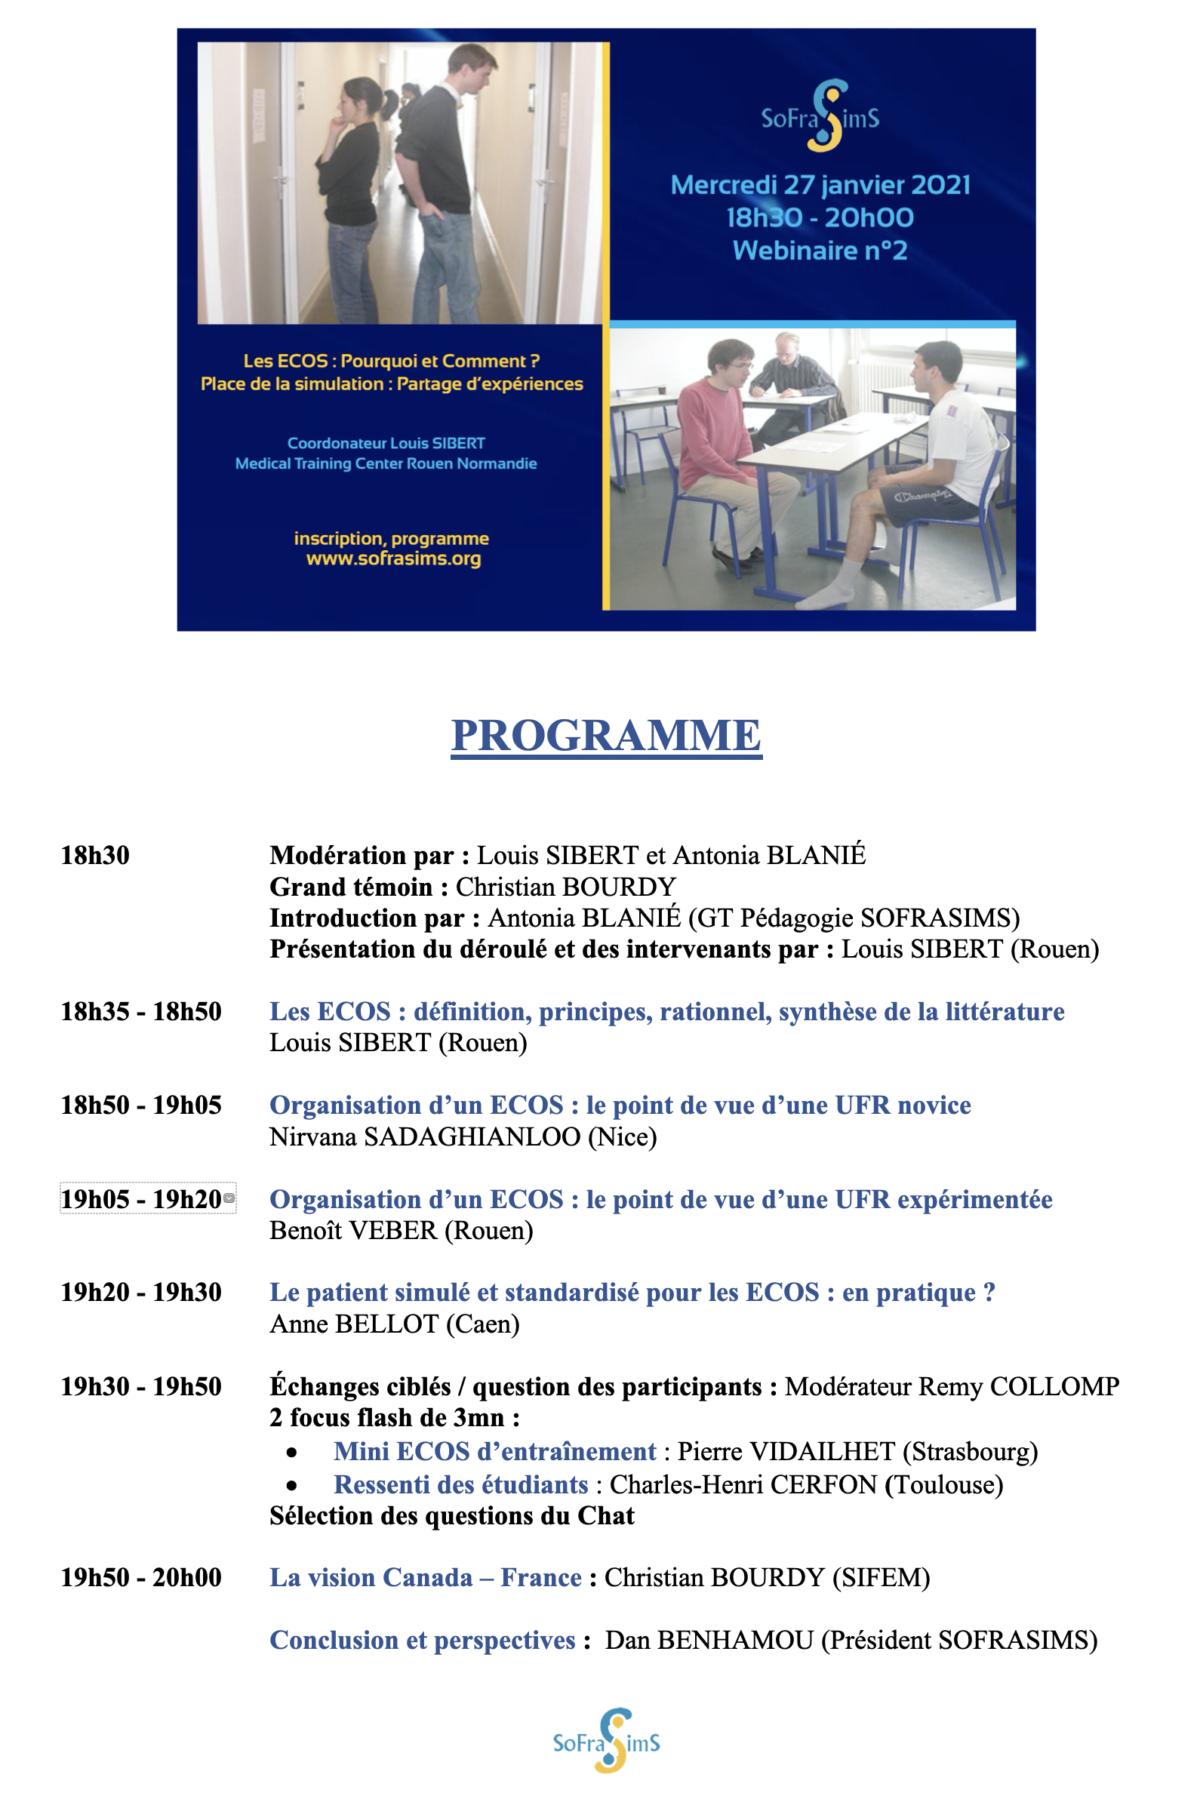 programme Webinaire ECOS SoFraSims